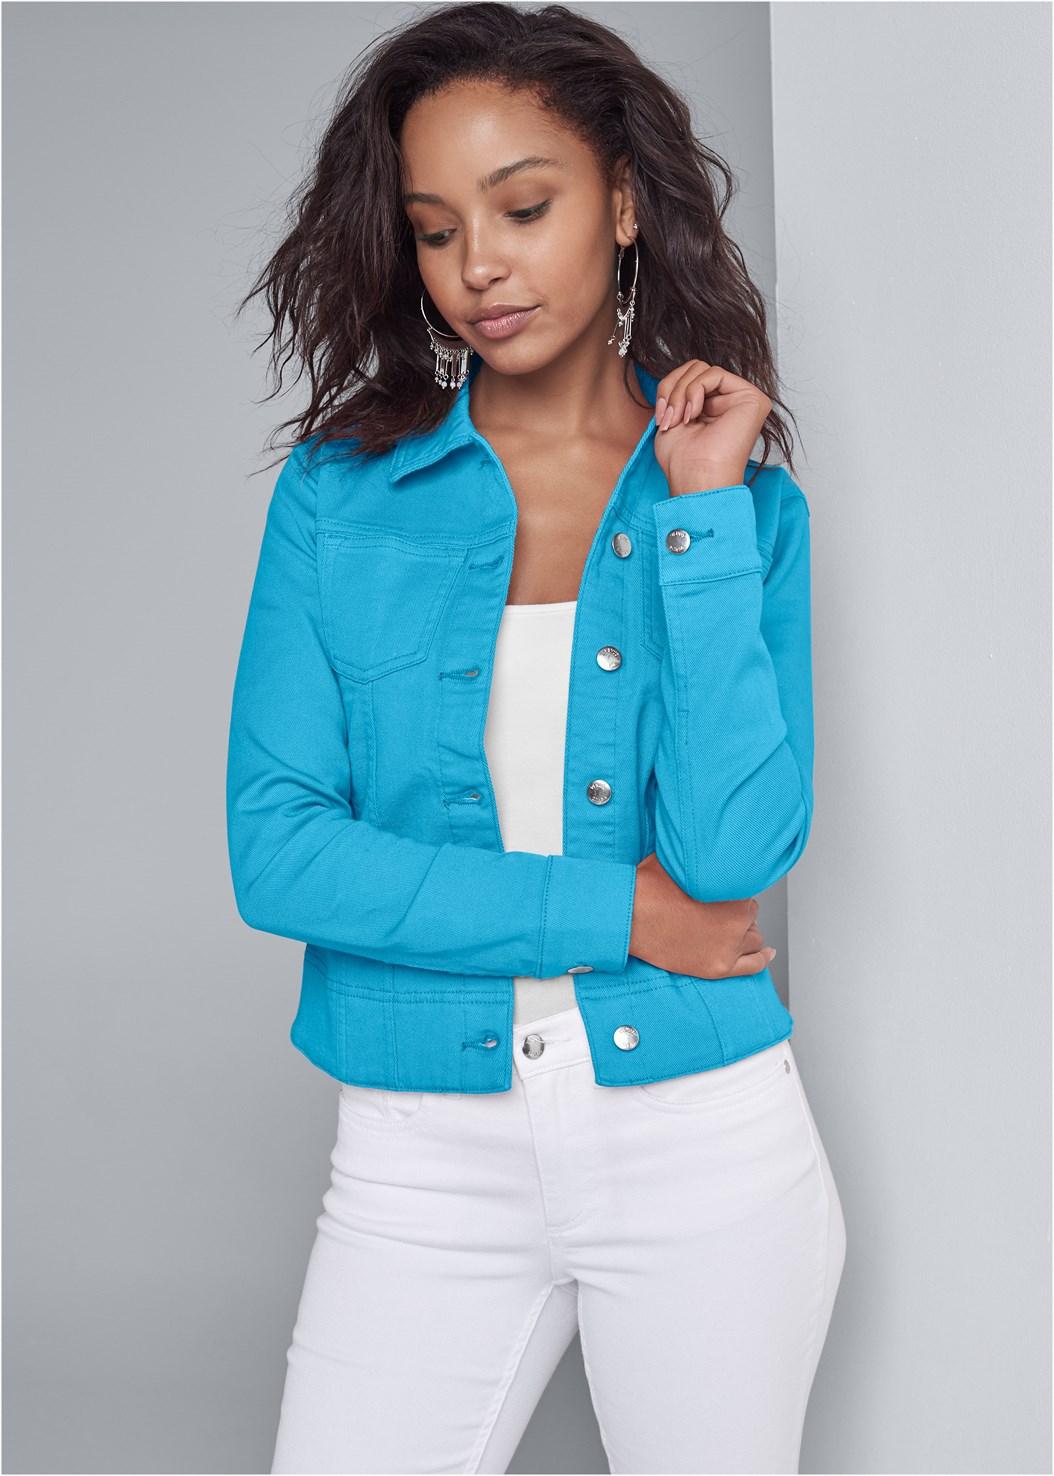 Jean Jacket,Basic Cami Two Pack,Mid Rise Color Skinny Jeans,Tassel Hoop Earring